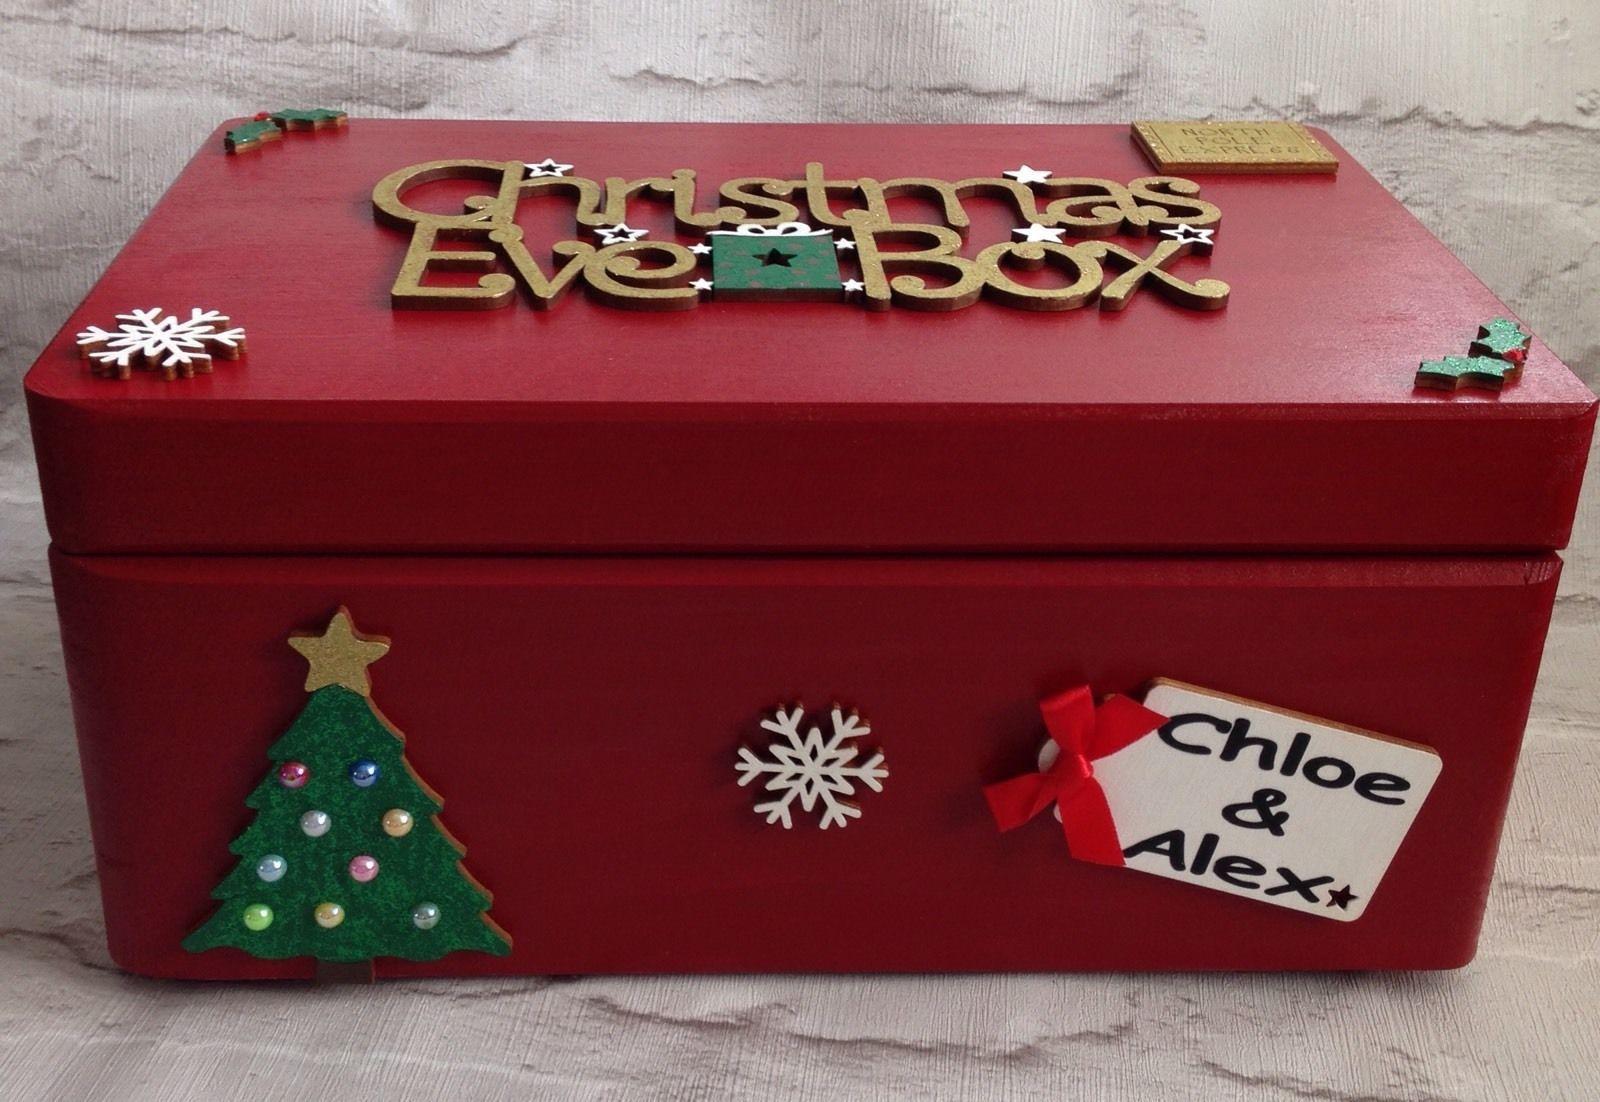 Personalised Christmas Eve Box Engraved Quality Large